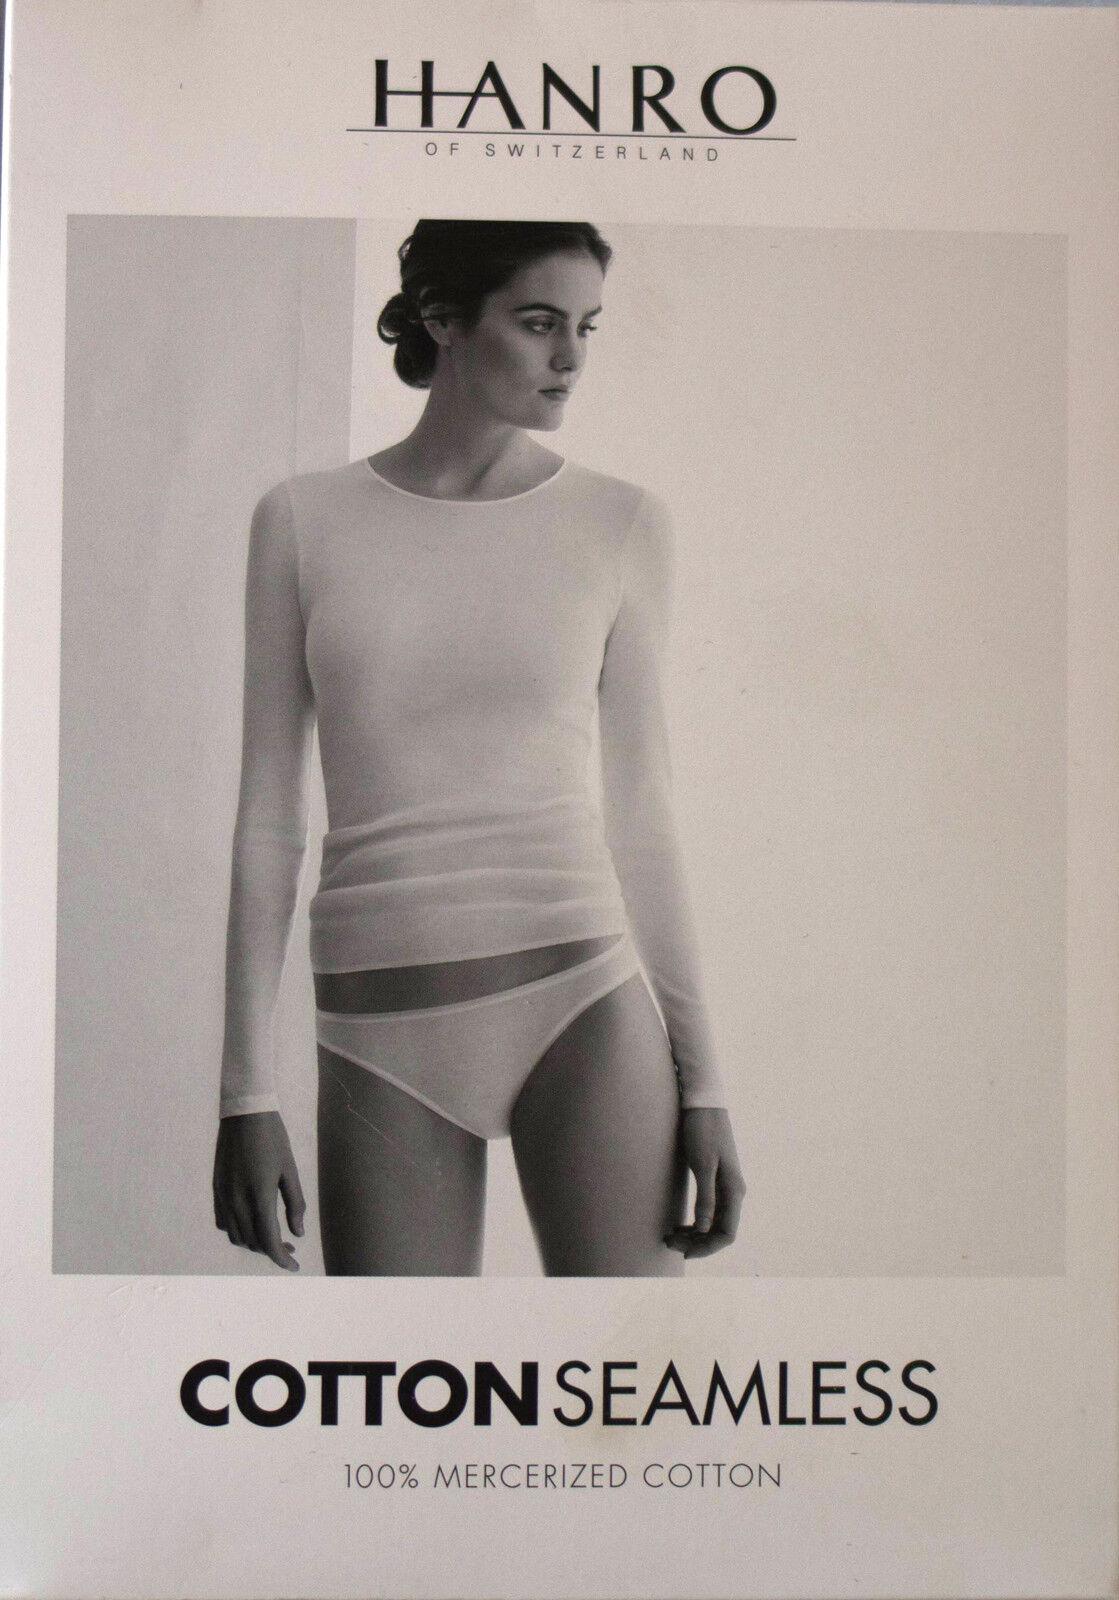 NEUF @@ T SHIRT M.L 100% COTON black HANRO Cotton Seamless + XS (FR36 38-34 36eur